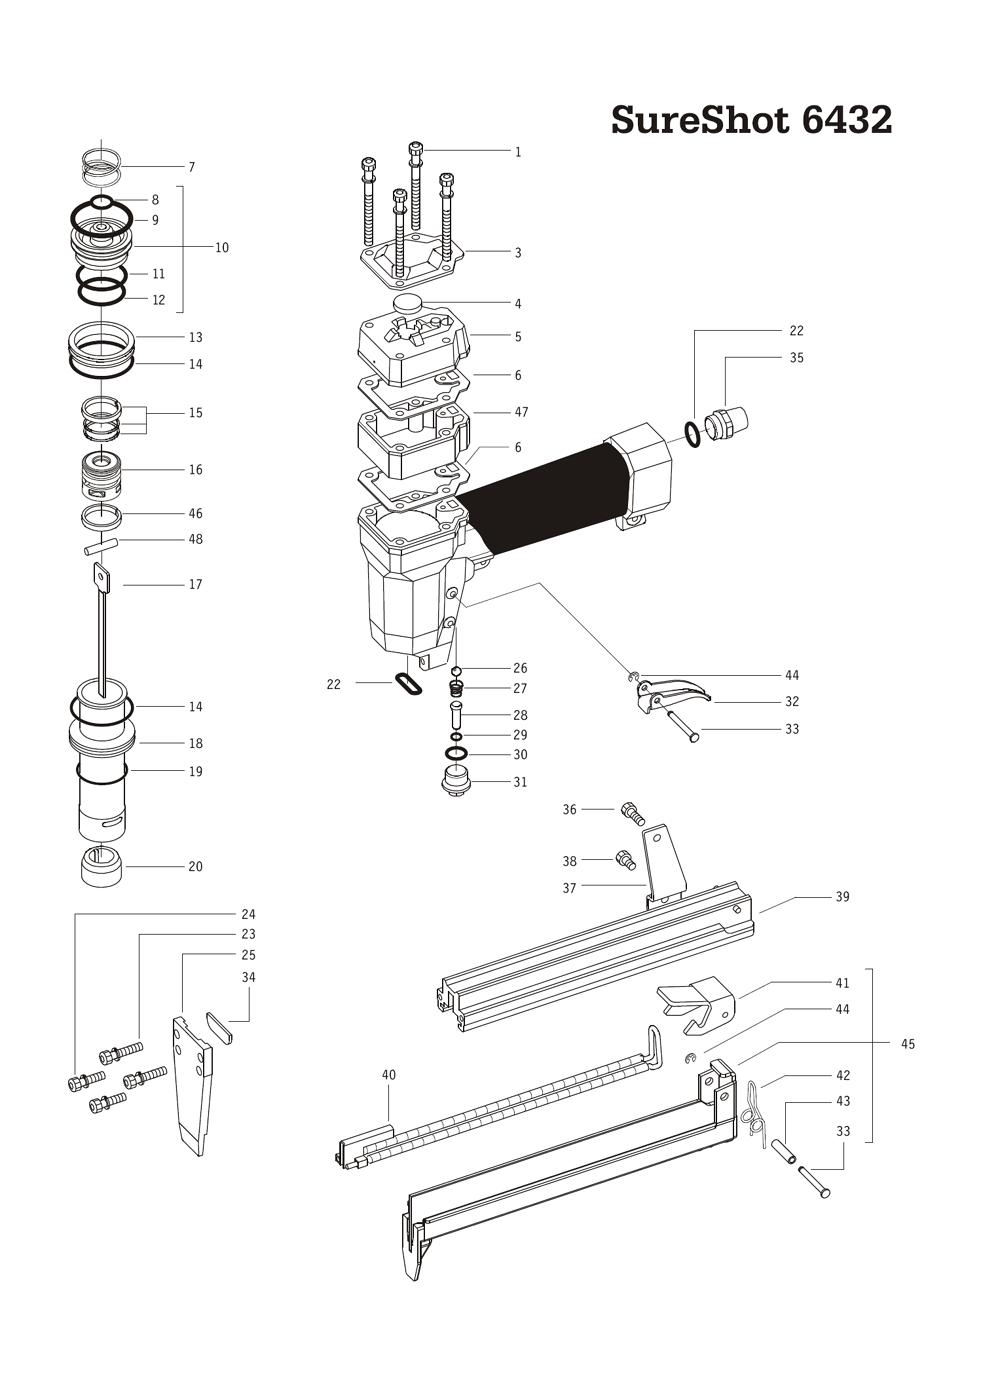 buy duo 8 u0026quot  to 1 19 ga  narrow crown stapler replacement tool parts